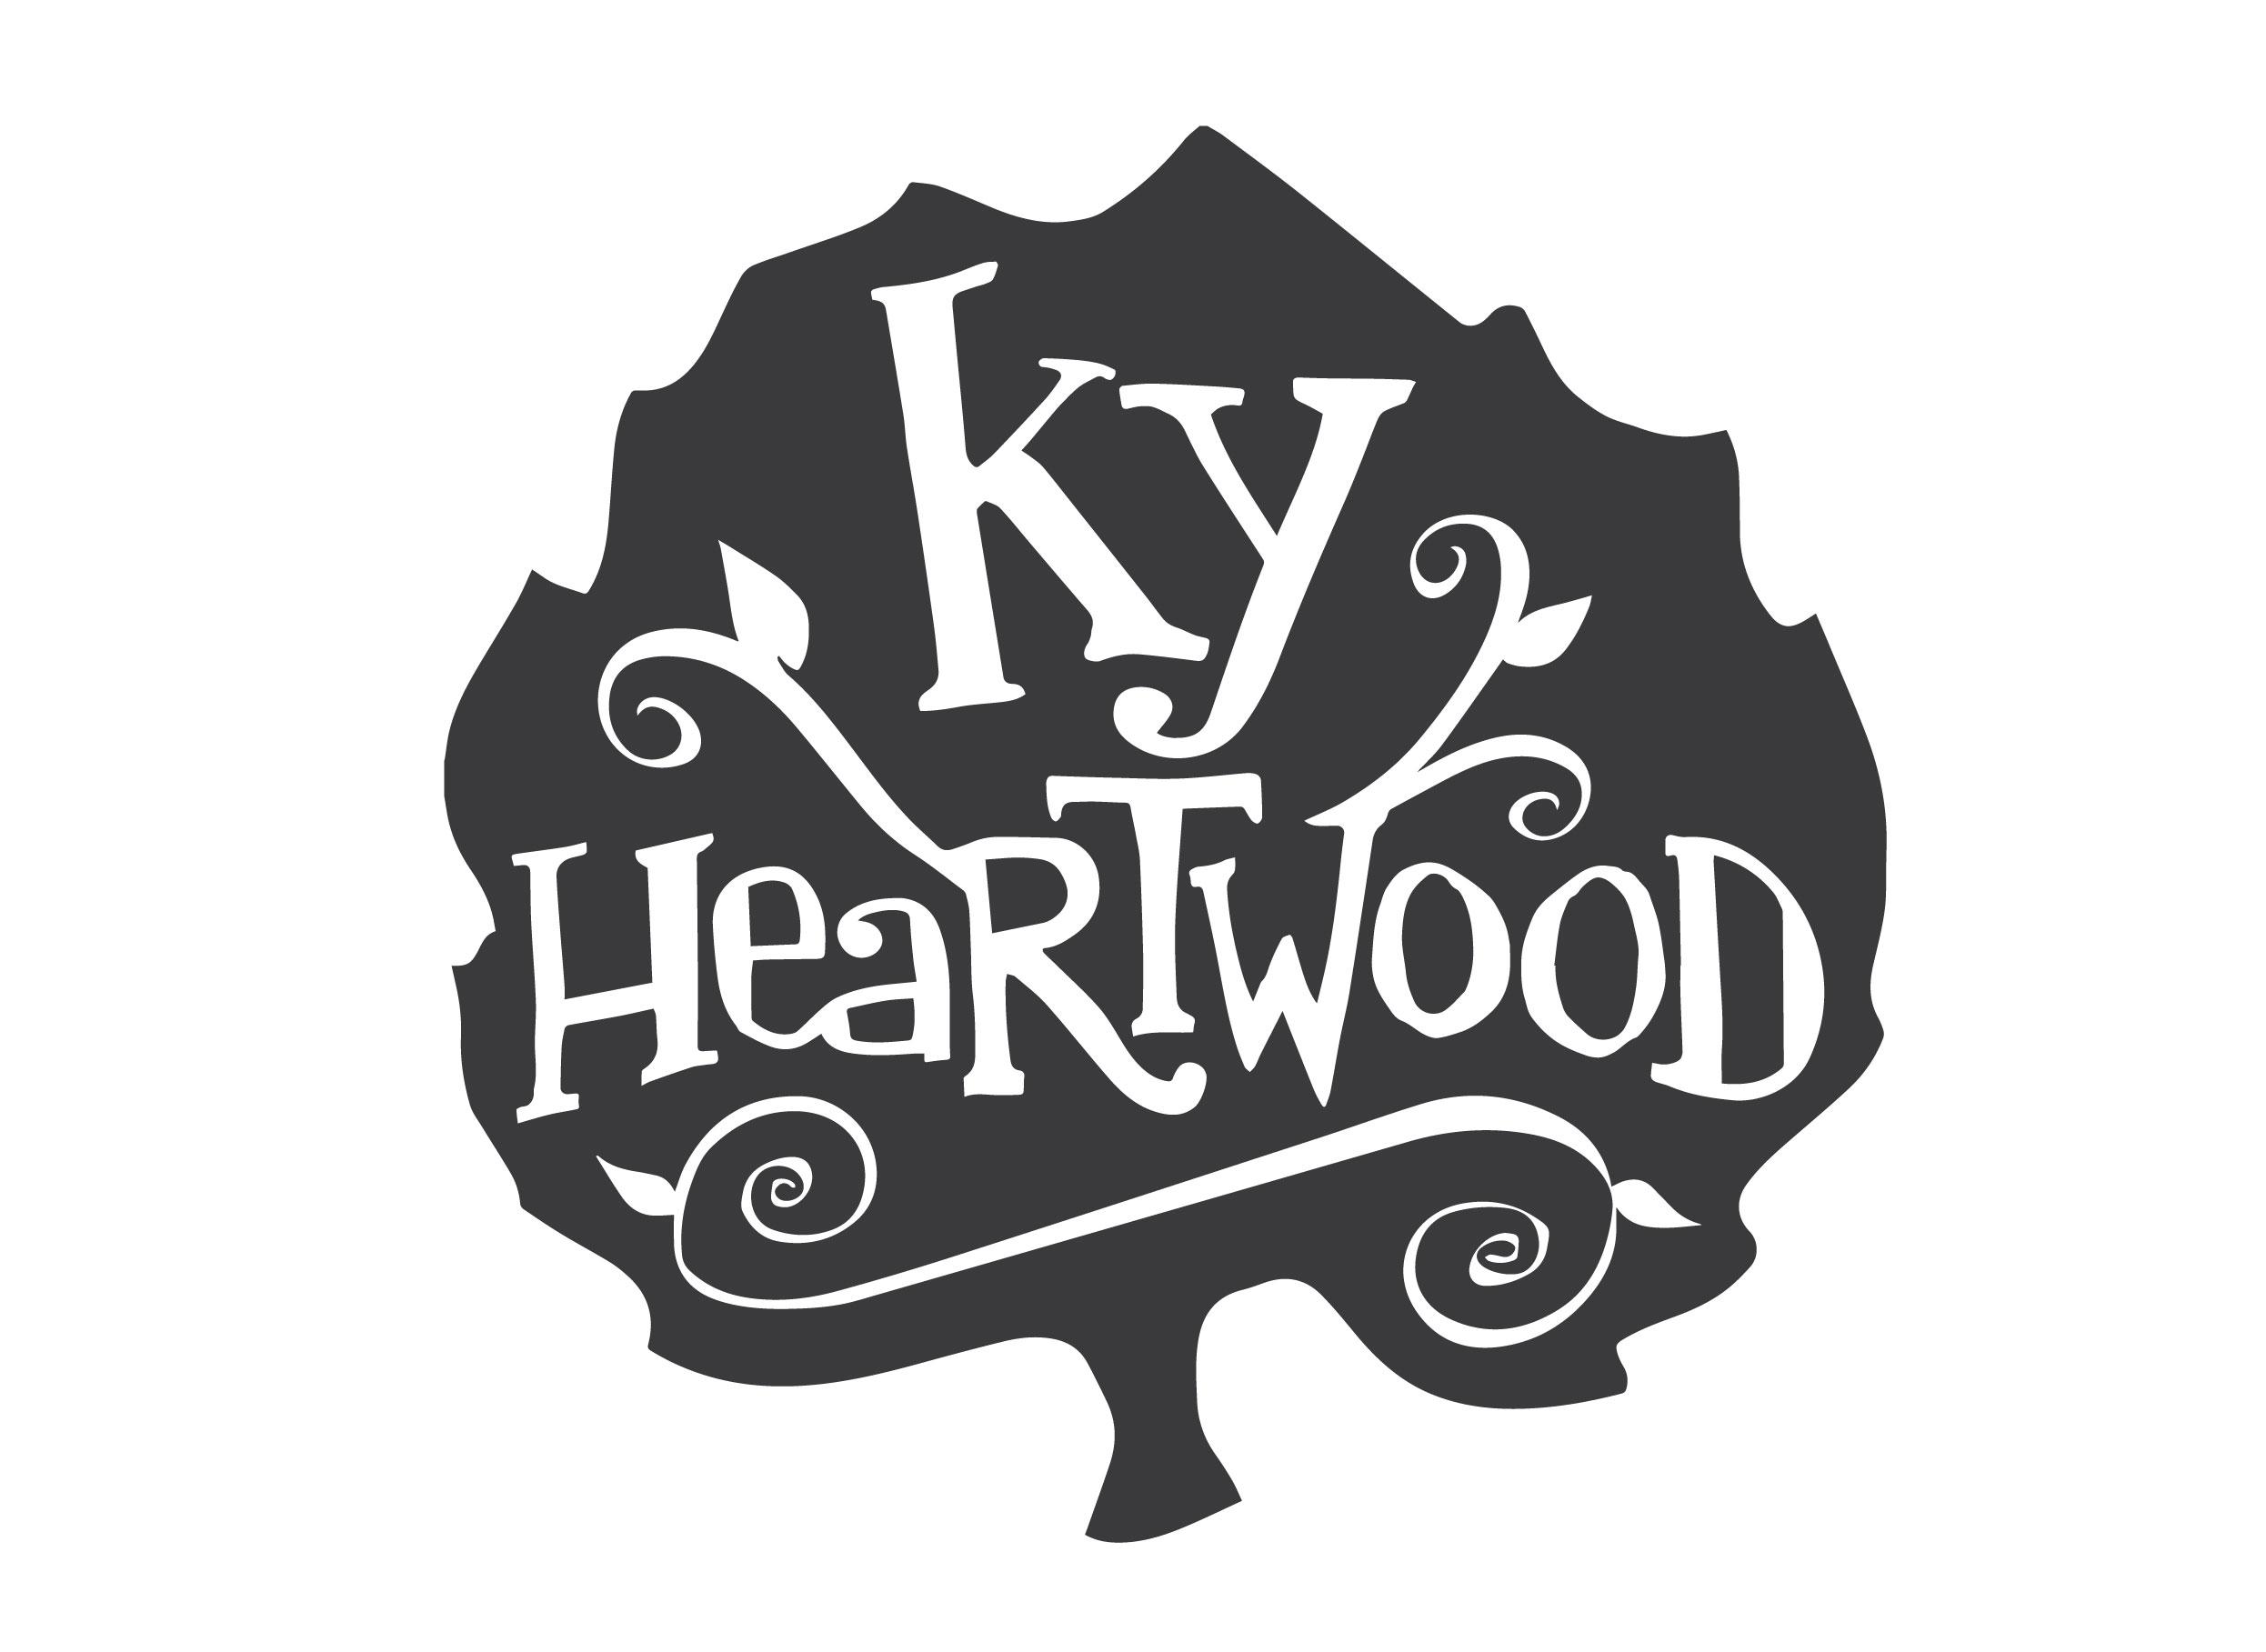 KYHeartwood-01.jpg